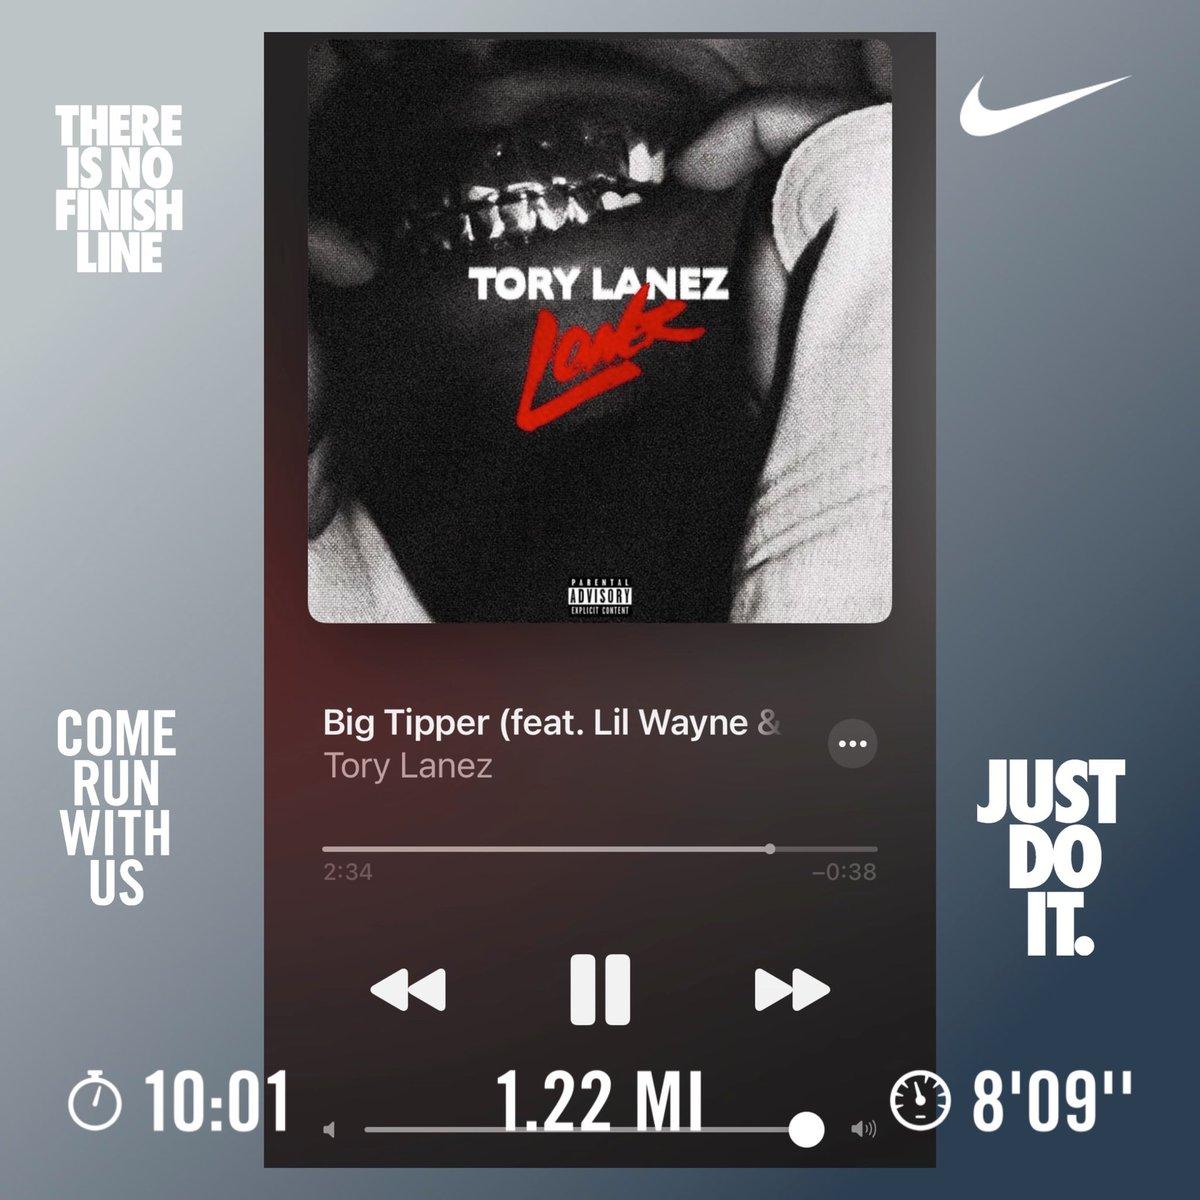 261 Straight Weeks #gymlife #gymrat #gymflow #chest #arms #abs #fitness #finishstrong #DjRaQuest #DjLife #Nikerunning #hustlehart #nike #nikerunning #FitDjs #MambaMentality